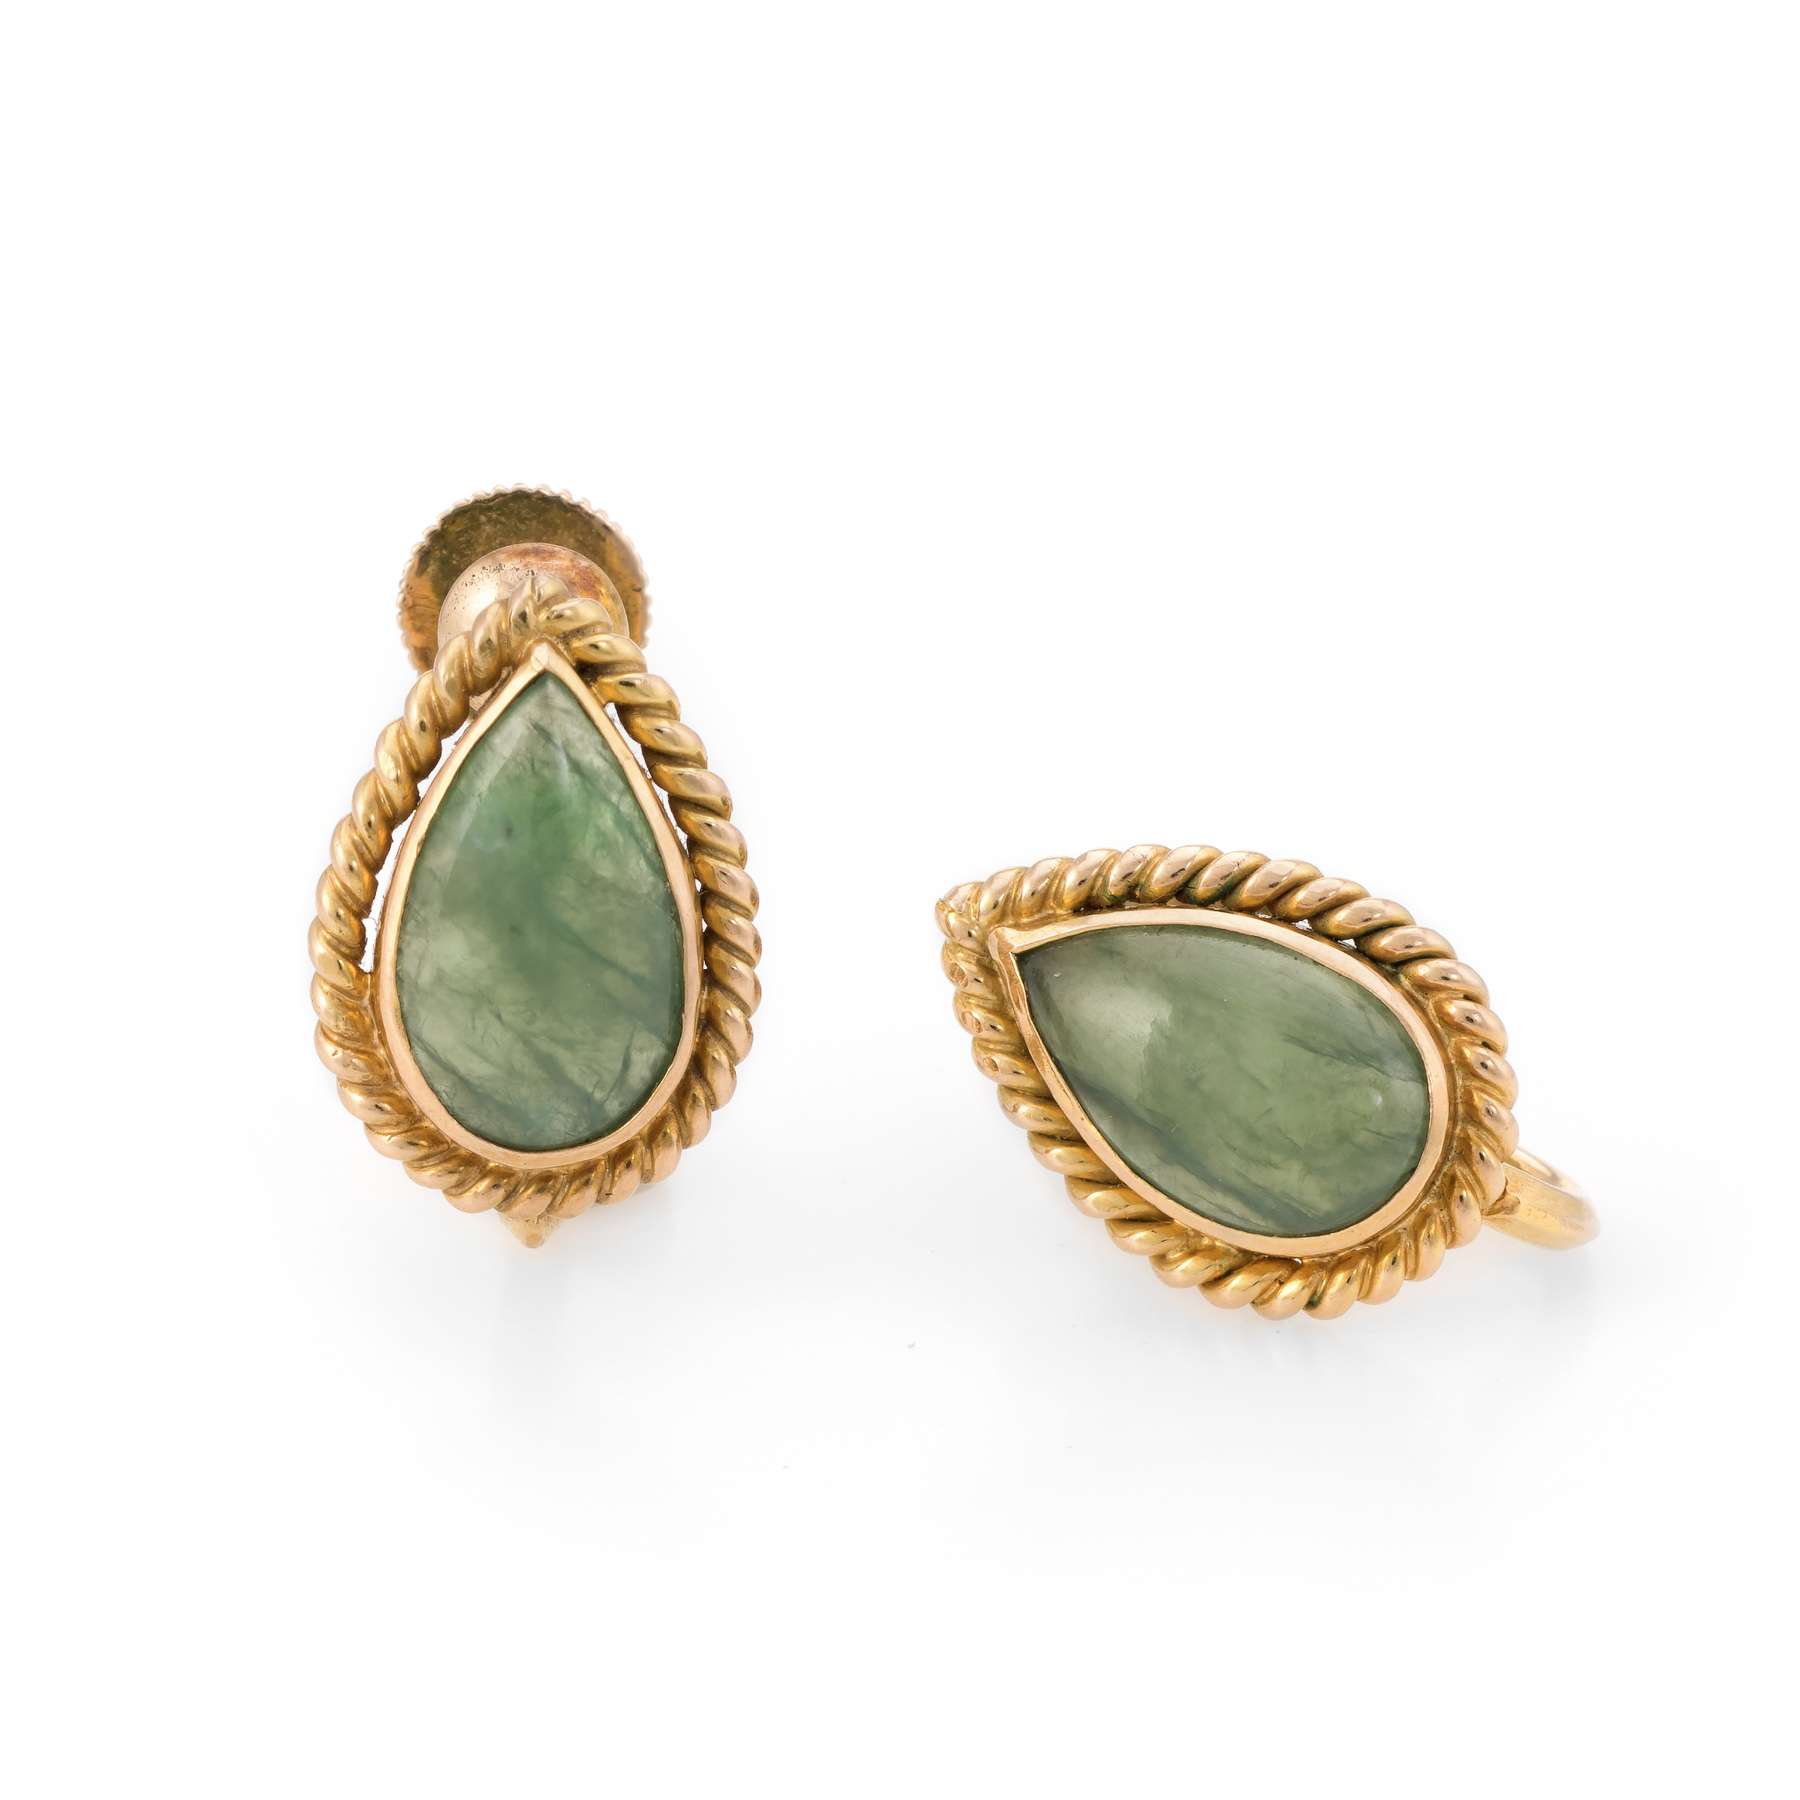 0b9be5cf2 Details about Pear Cut Jade Earrings Vintage 14k Yellow Gold Estate Fine  Jewelry Screw Back